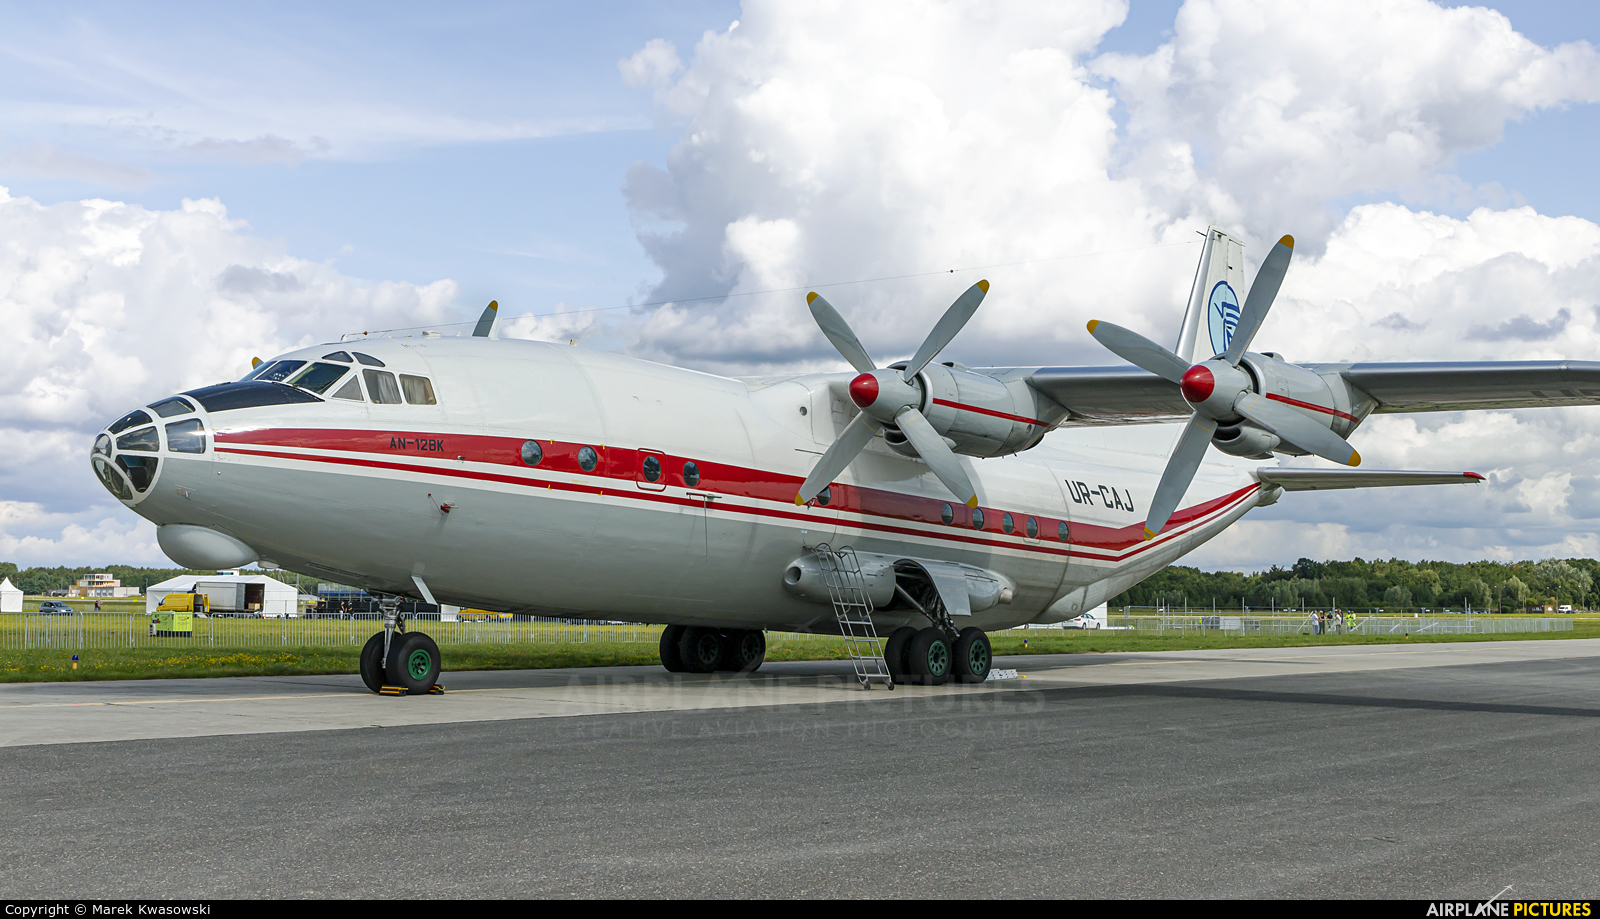 Ukraine Air Alliance UR-CAJ aircraft at Gdynia- Babie Doły (Oksywie)